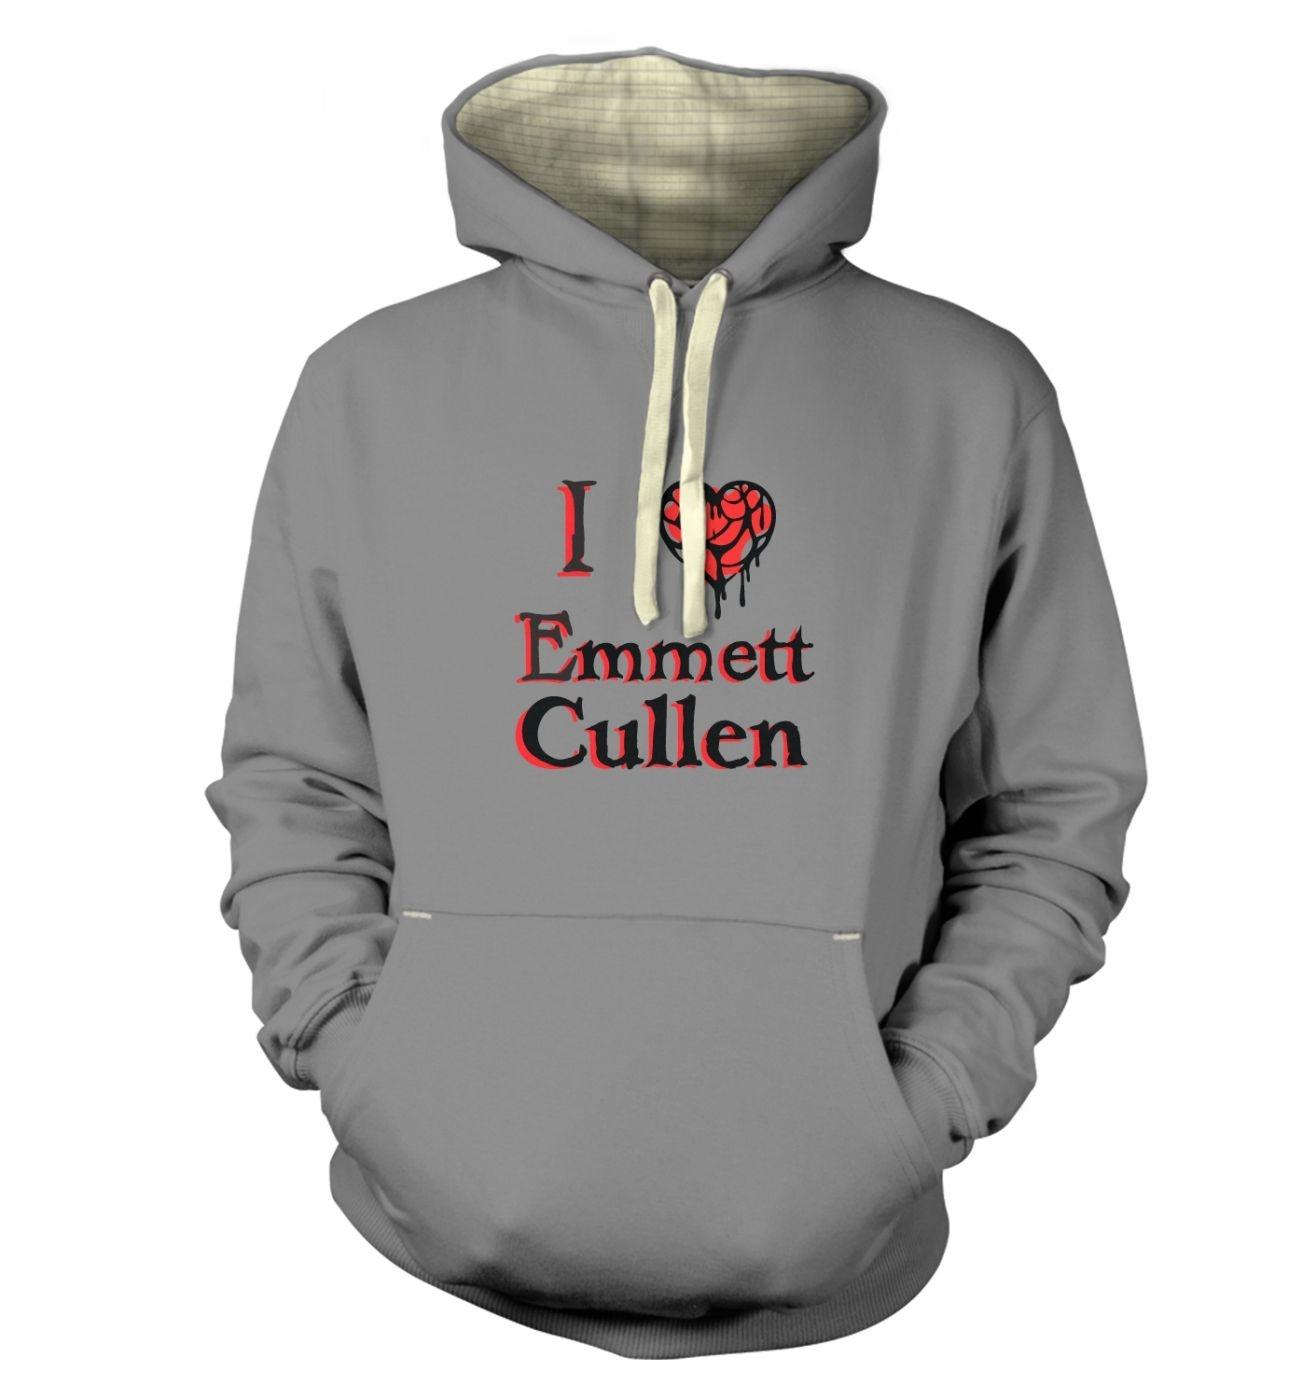 I heart Emmett Cullen premium hoodie - Inspired by Twilight